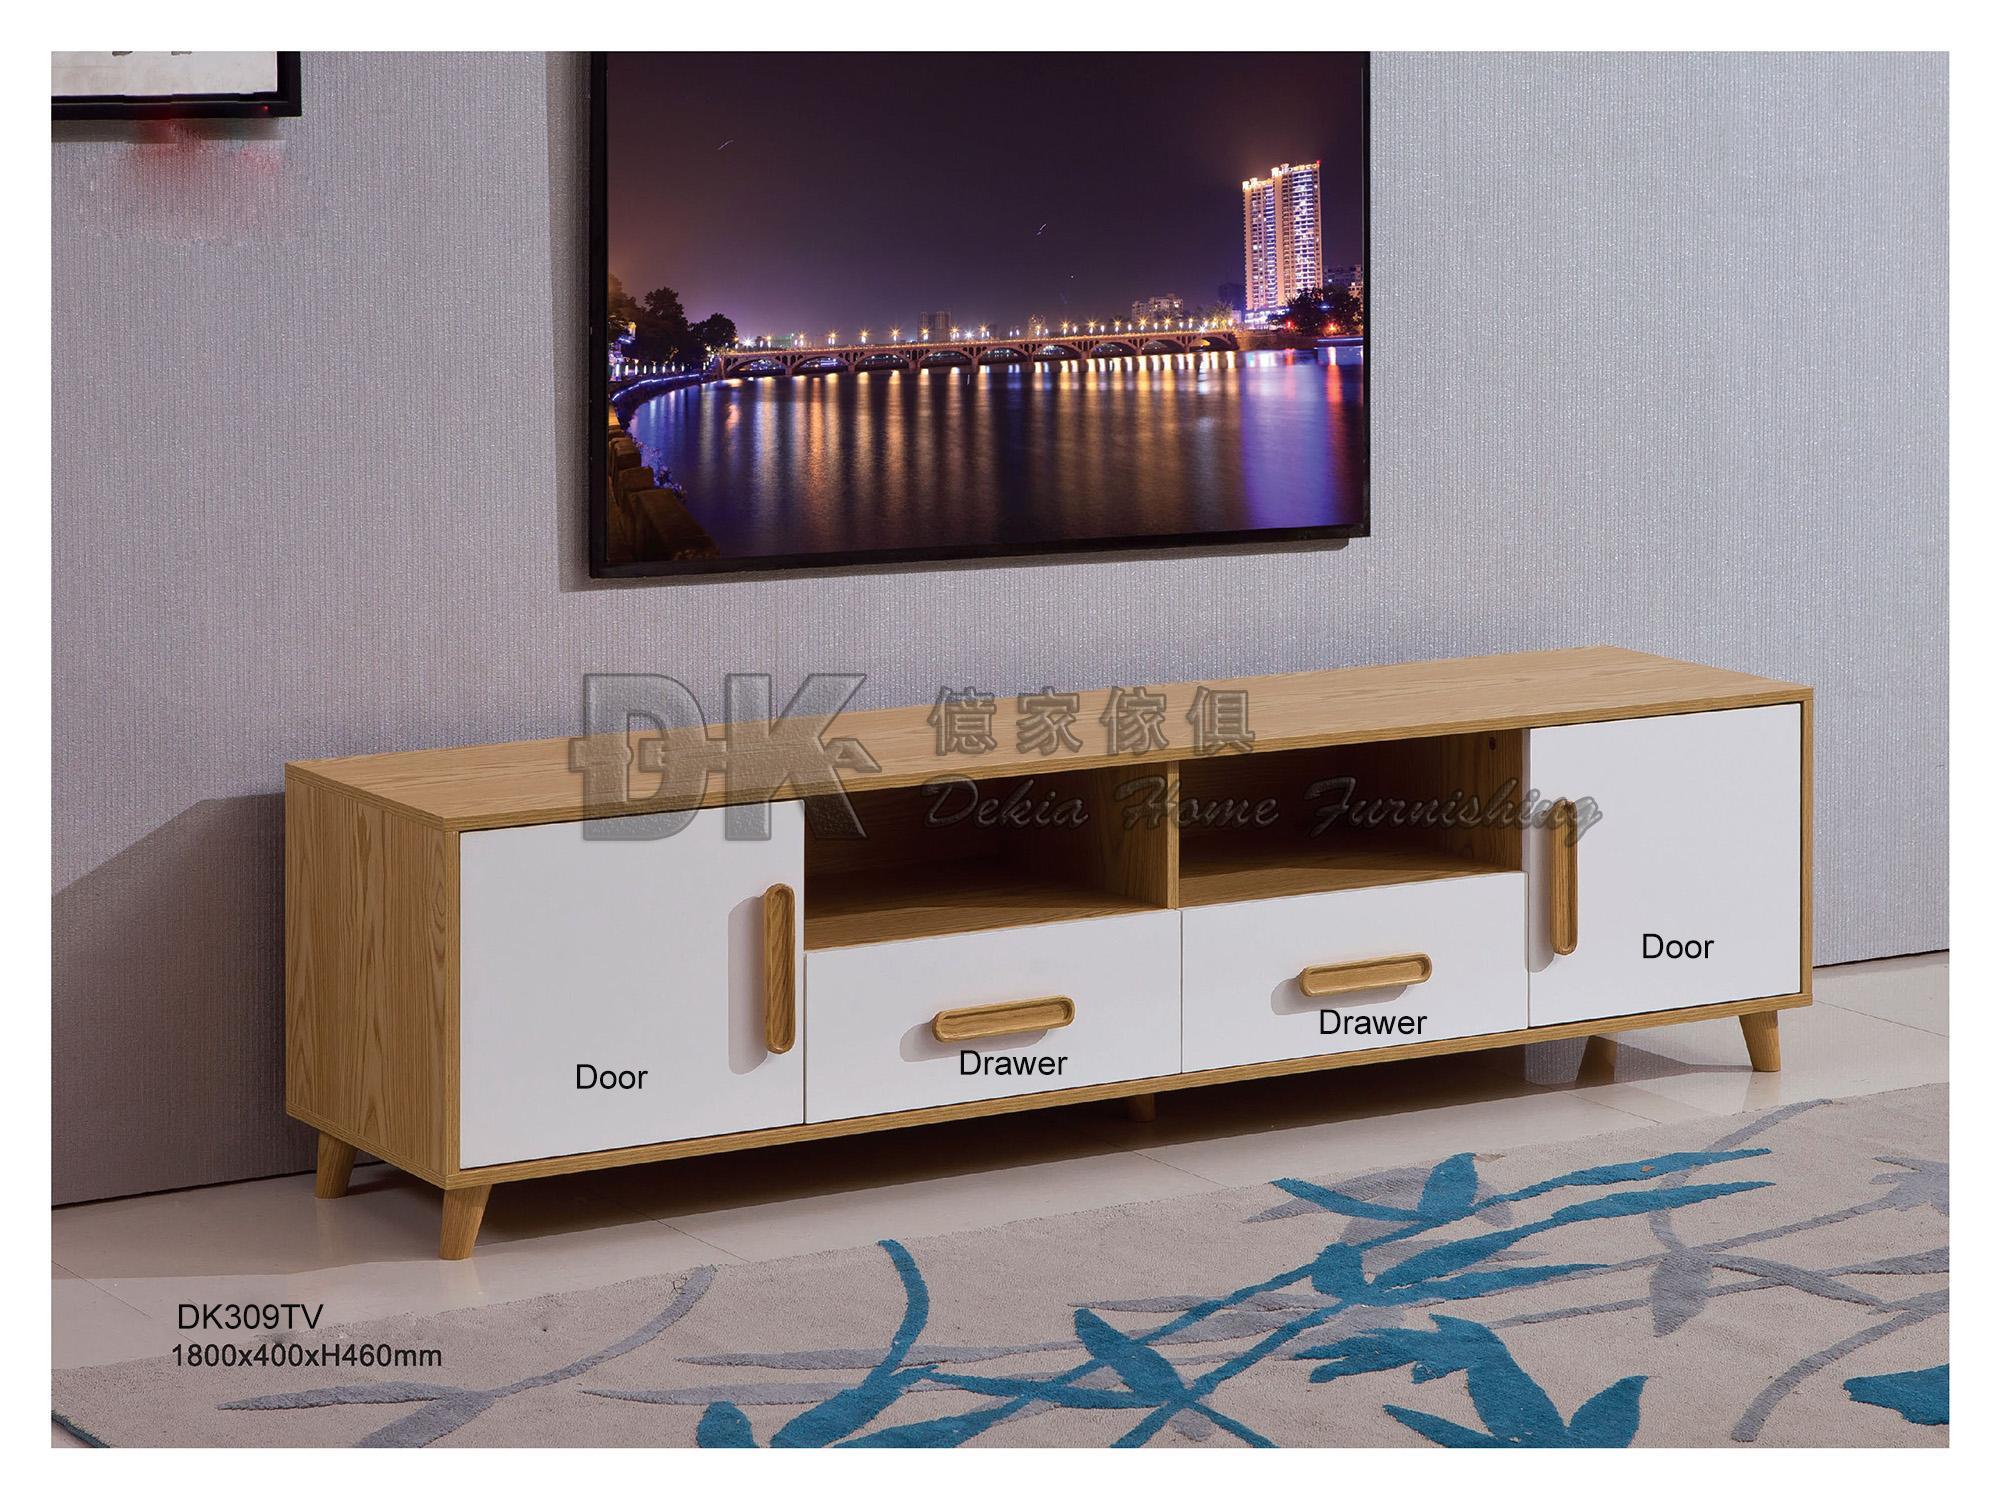 DK309TV 180cm TV Console